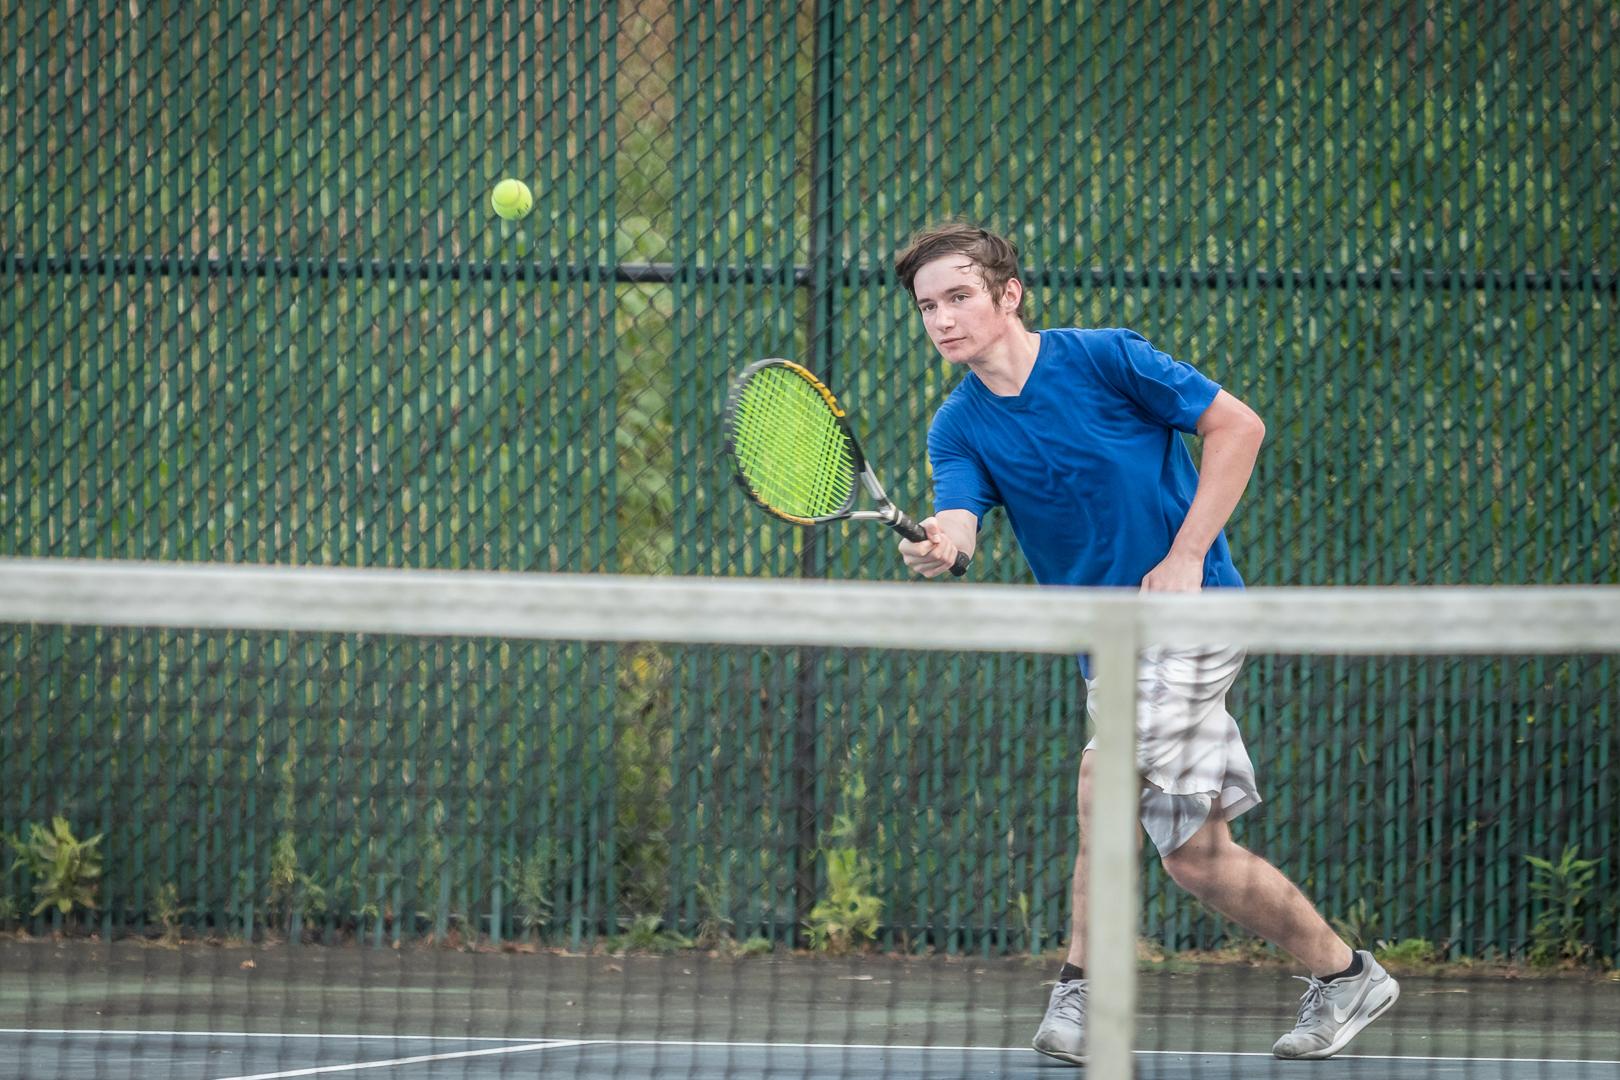 Marian-Boys-Tennis-1683.jpg